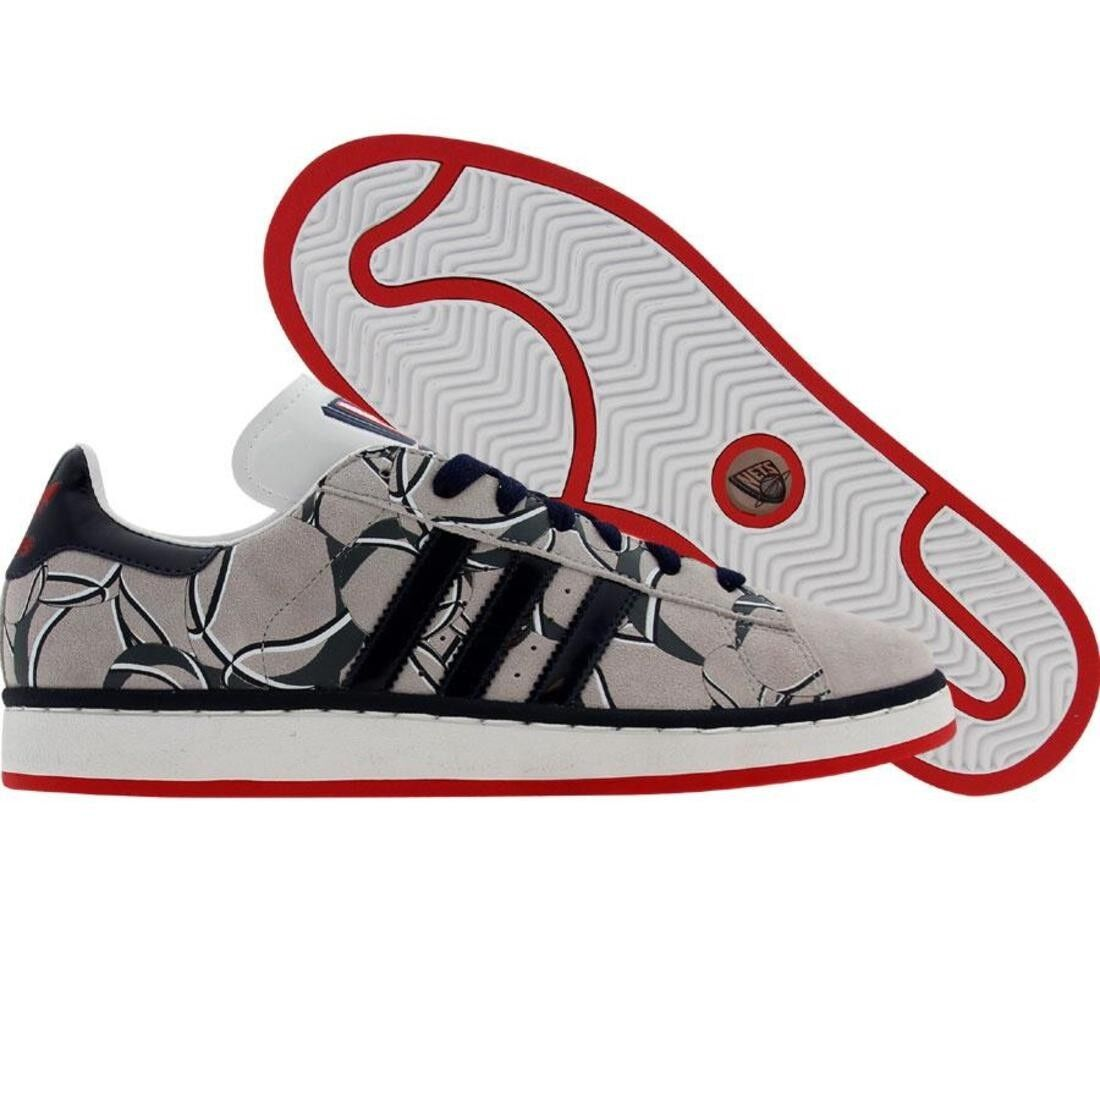 64.99 Adidas Campus II 2 - New Jersey Nets (sigrnb   pannba   redsld) 044350